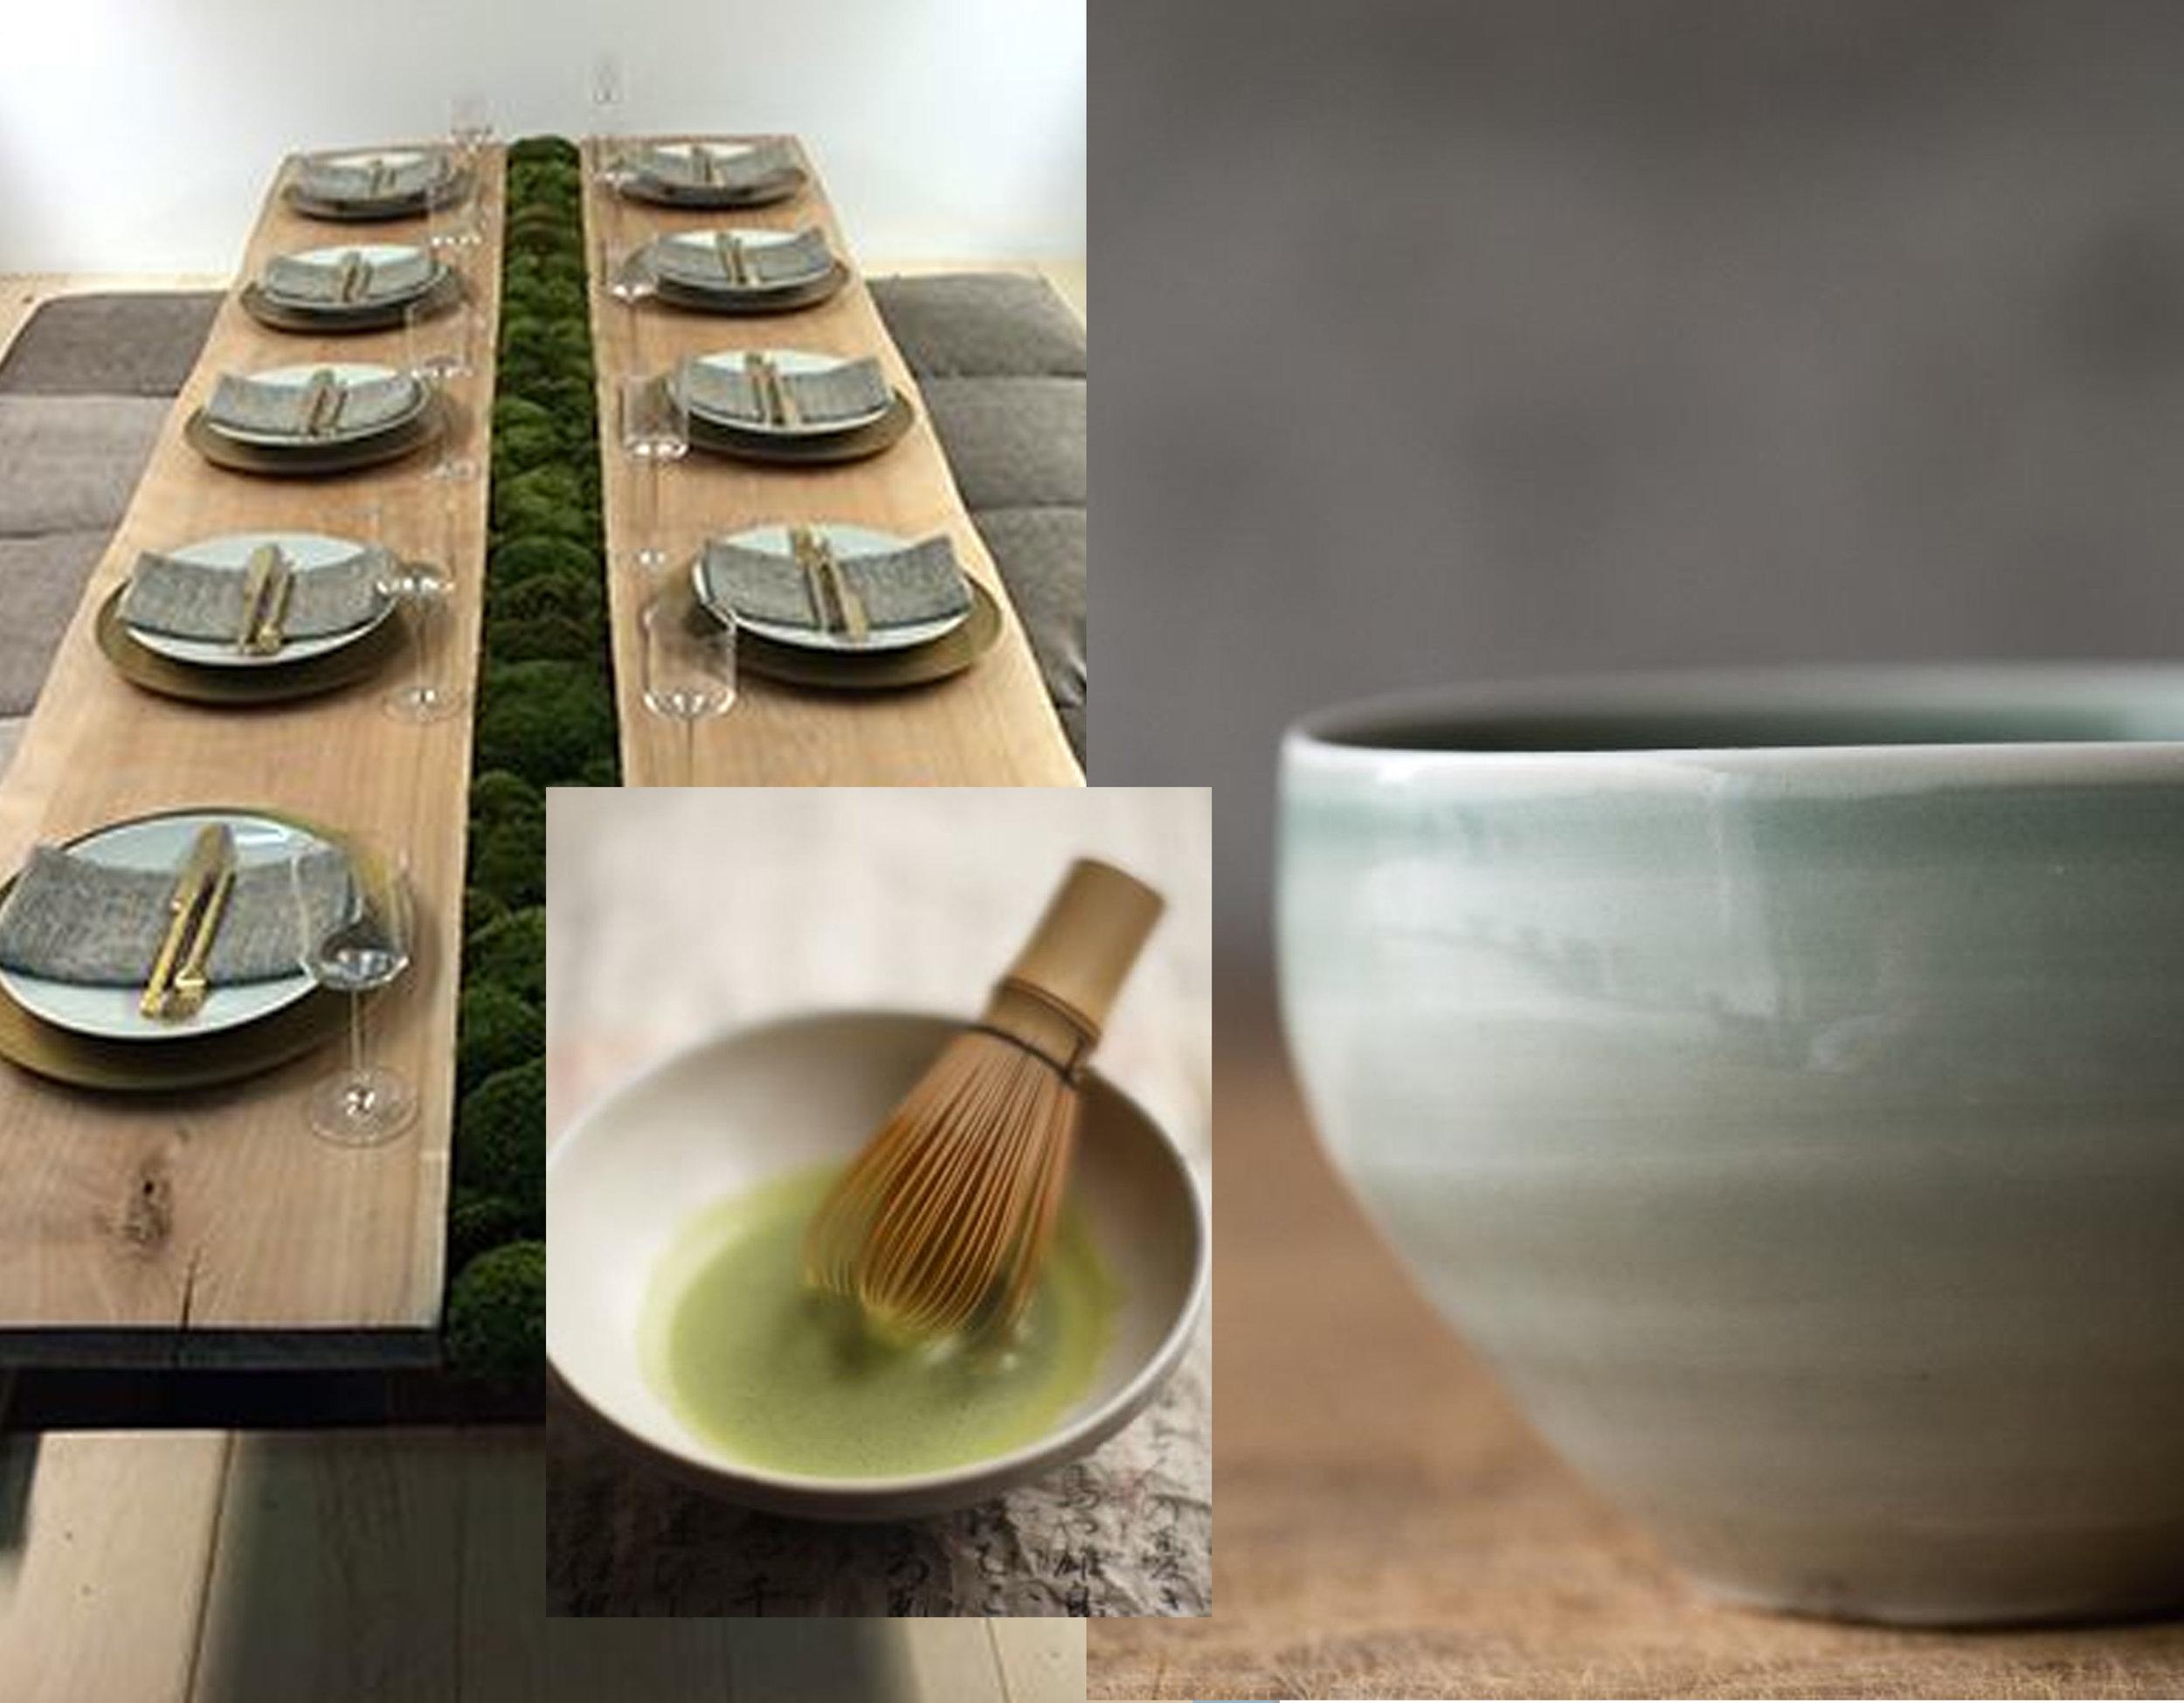 tabletop decoration via  The Nest  - Japanese tea cup via  Pinterest  - picture tea ceremony via  Living a Life in Flower